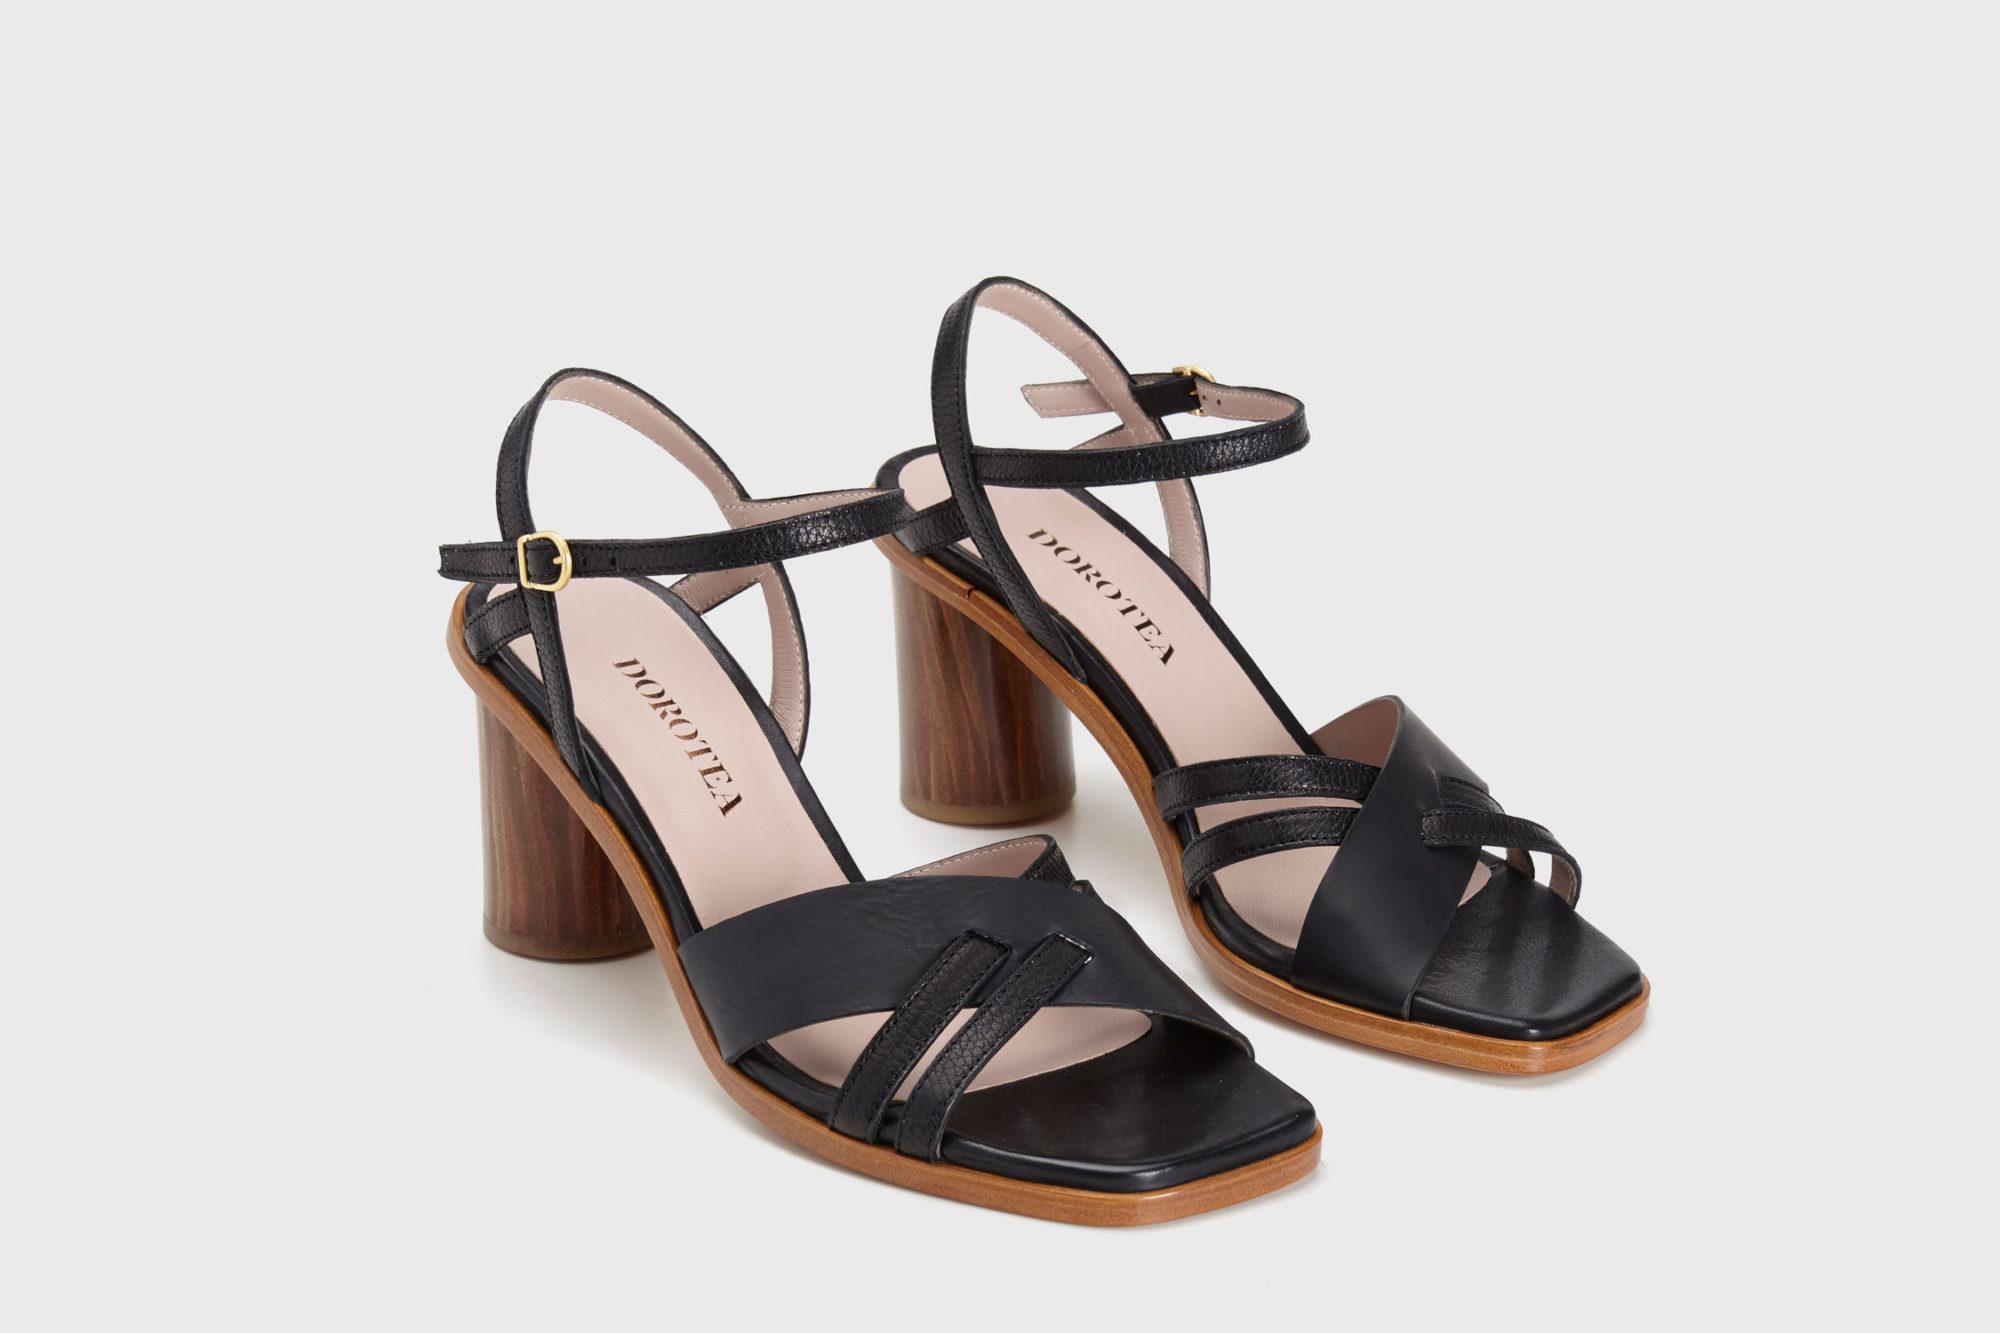 Dorotea sandalia de tacón alto Sophie ss17 par